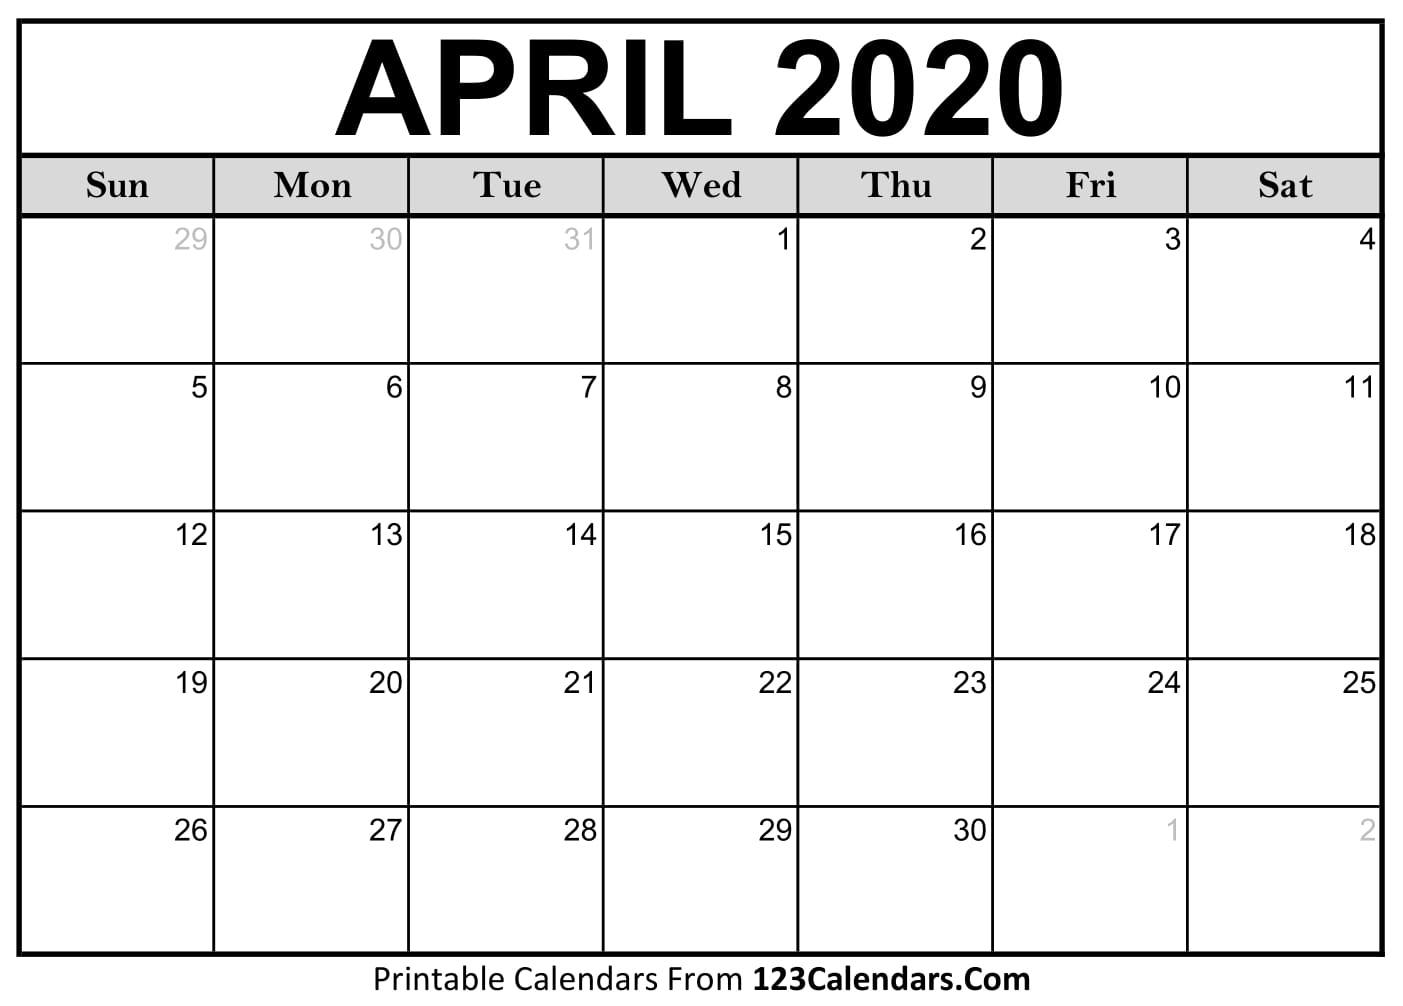 April 2020 Printable Calendar | 123Calendars throughout 2020 Calander To Write On